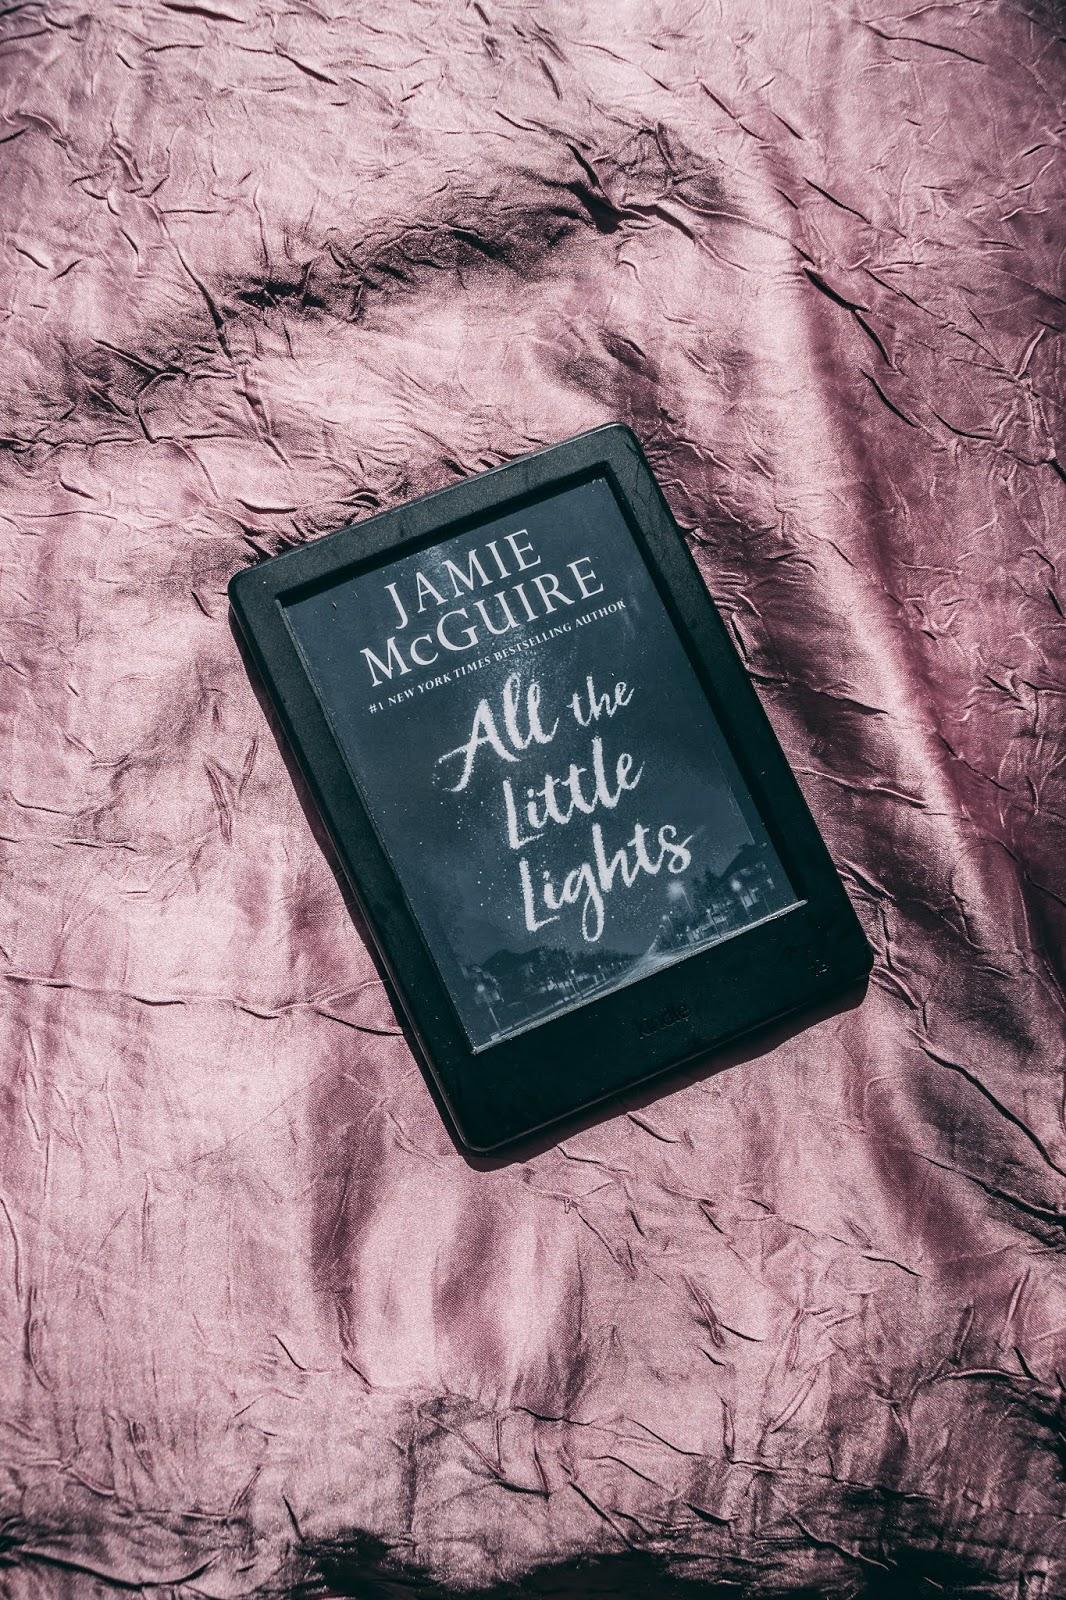 all the little lights - jamie mcguire